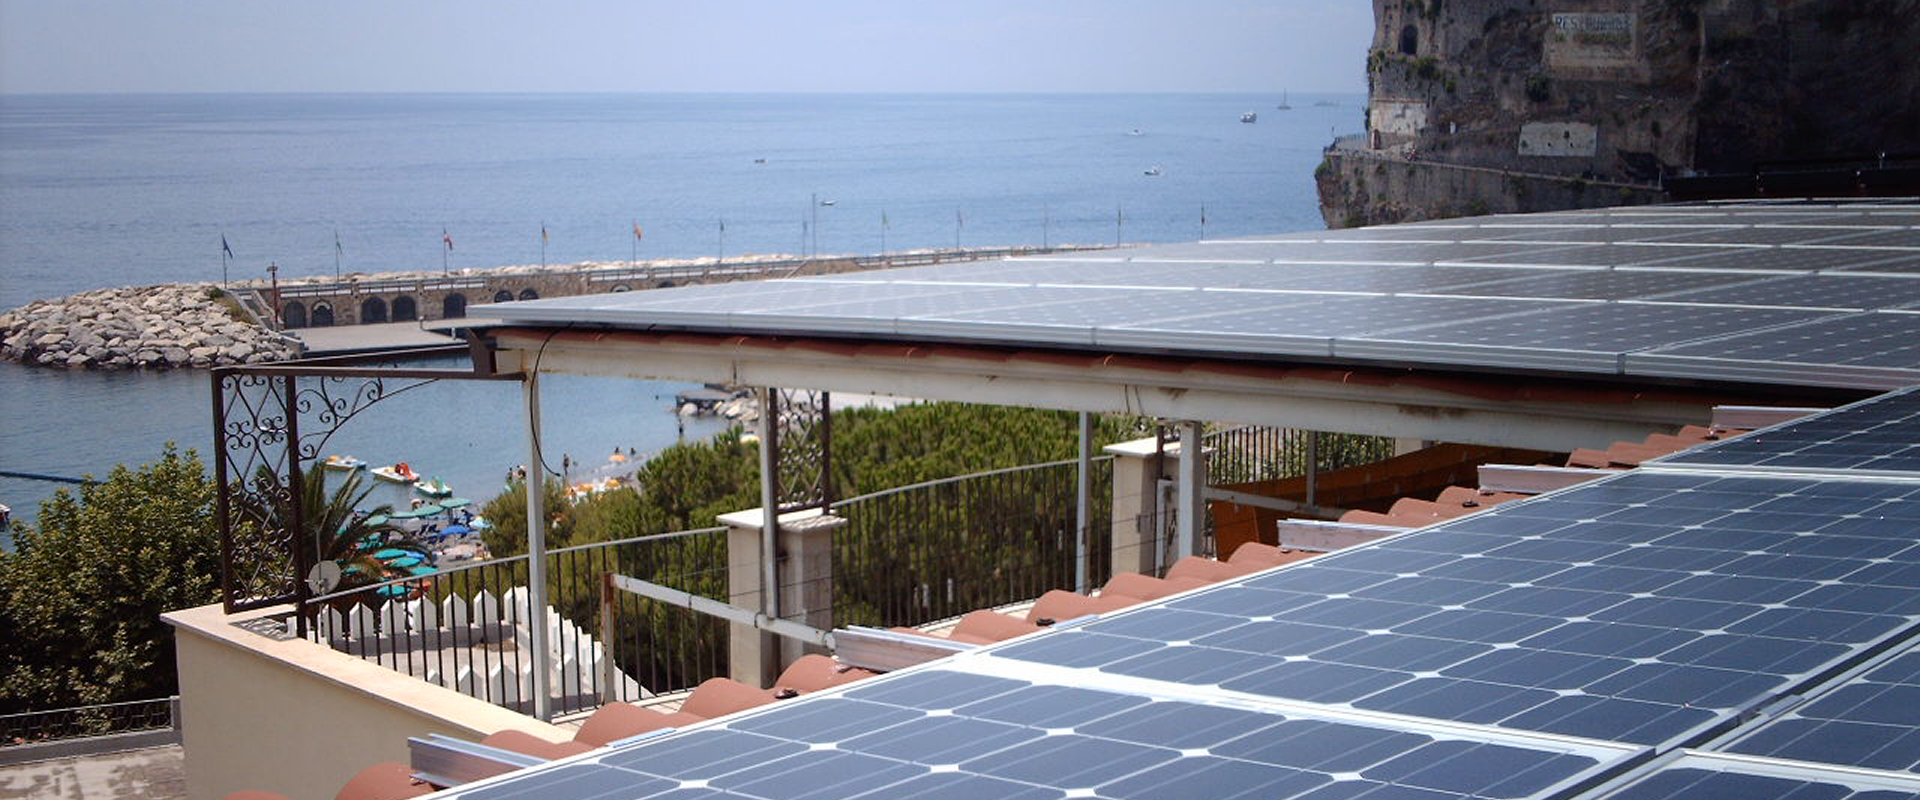 Foto Impianto Fotovoltaico Novare